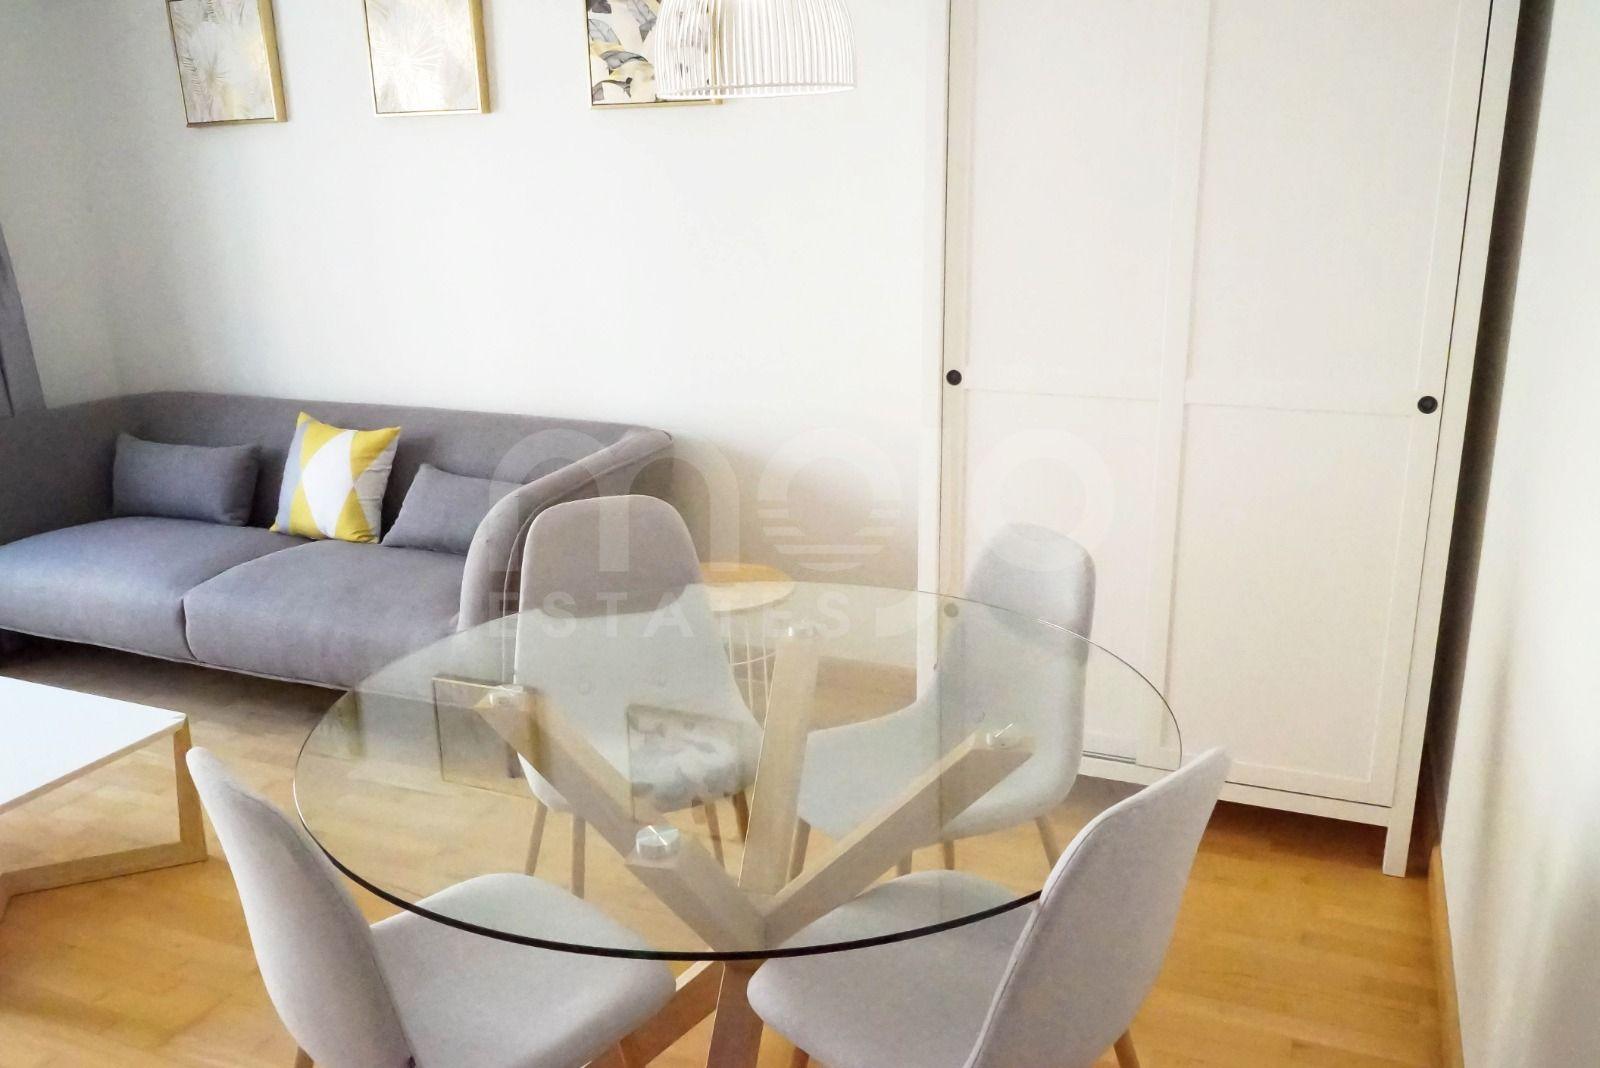 Ground Floor Apartment for sale in El Molinillo - Capuchinos, Malaga